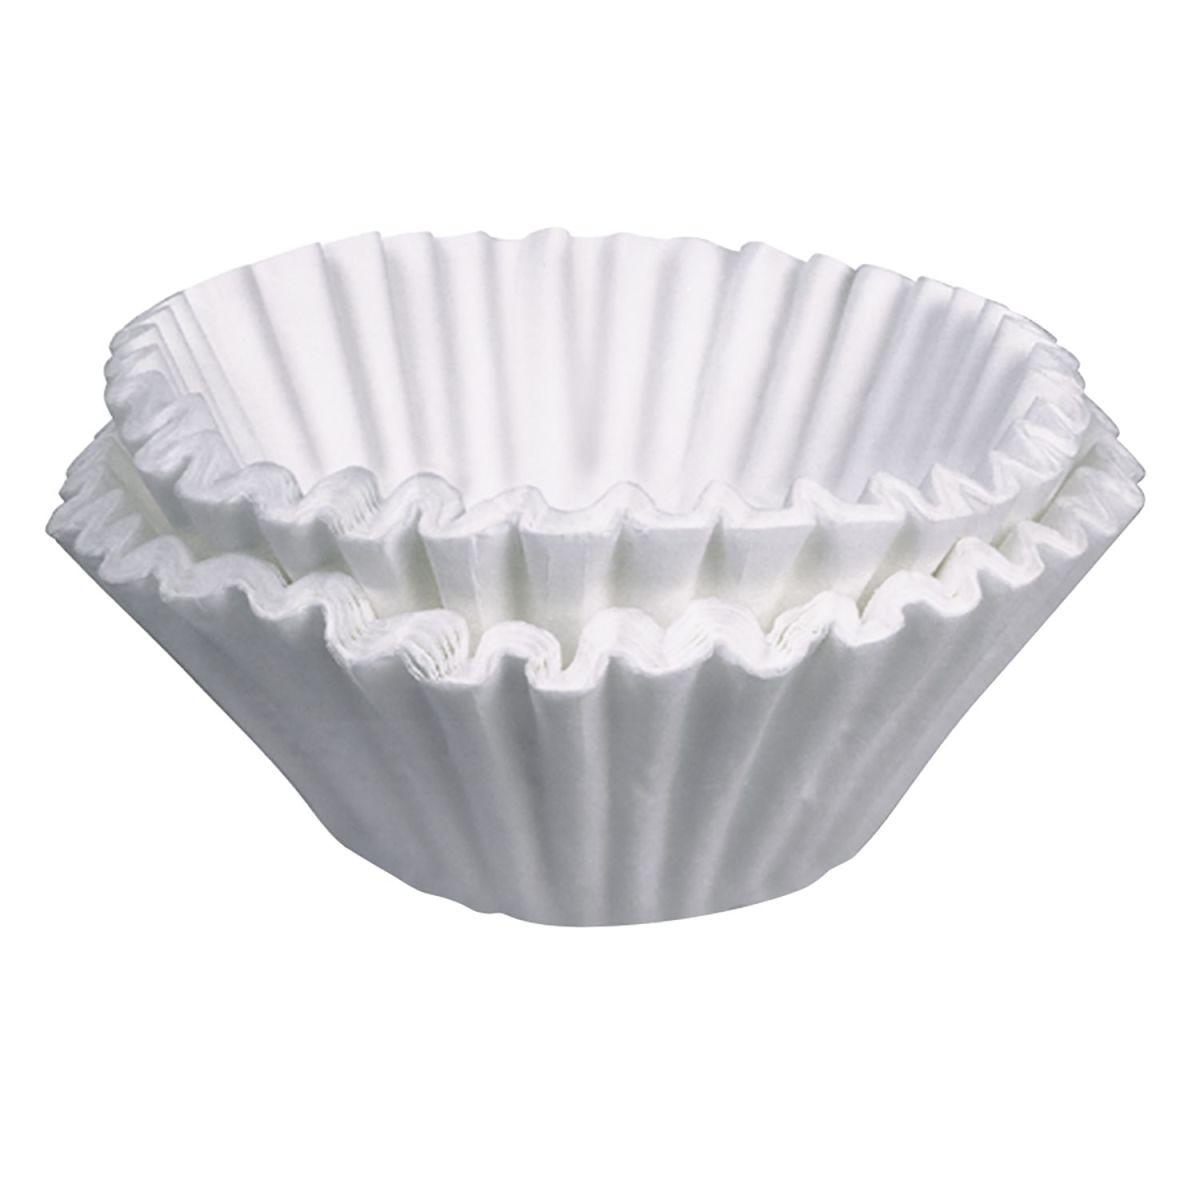 Tea & Coffee Paper Filters 500/cs